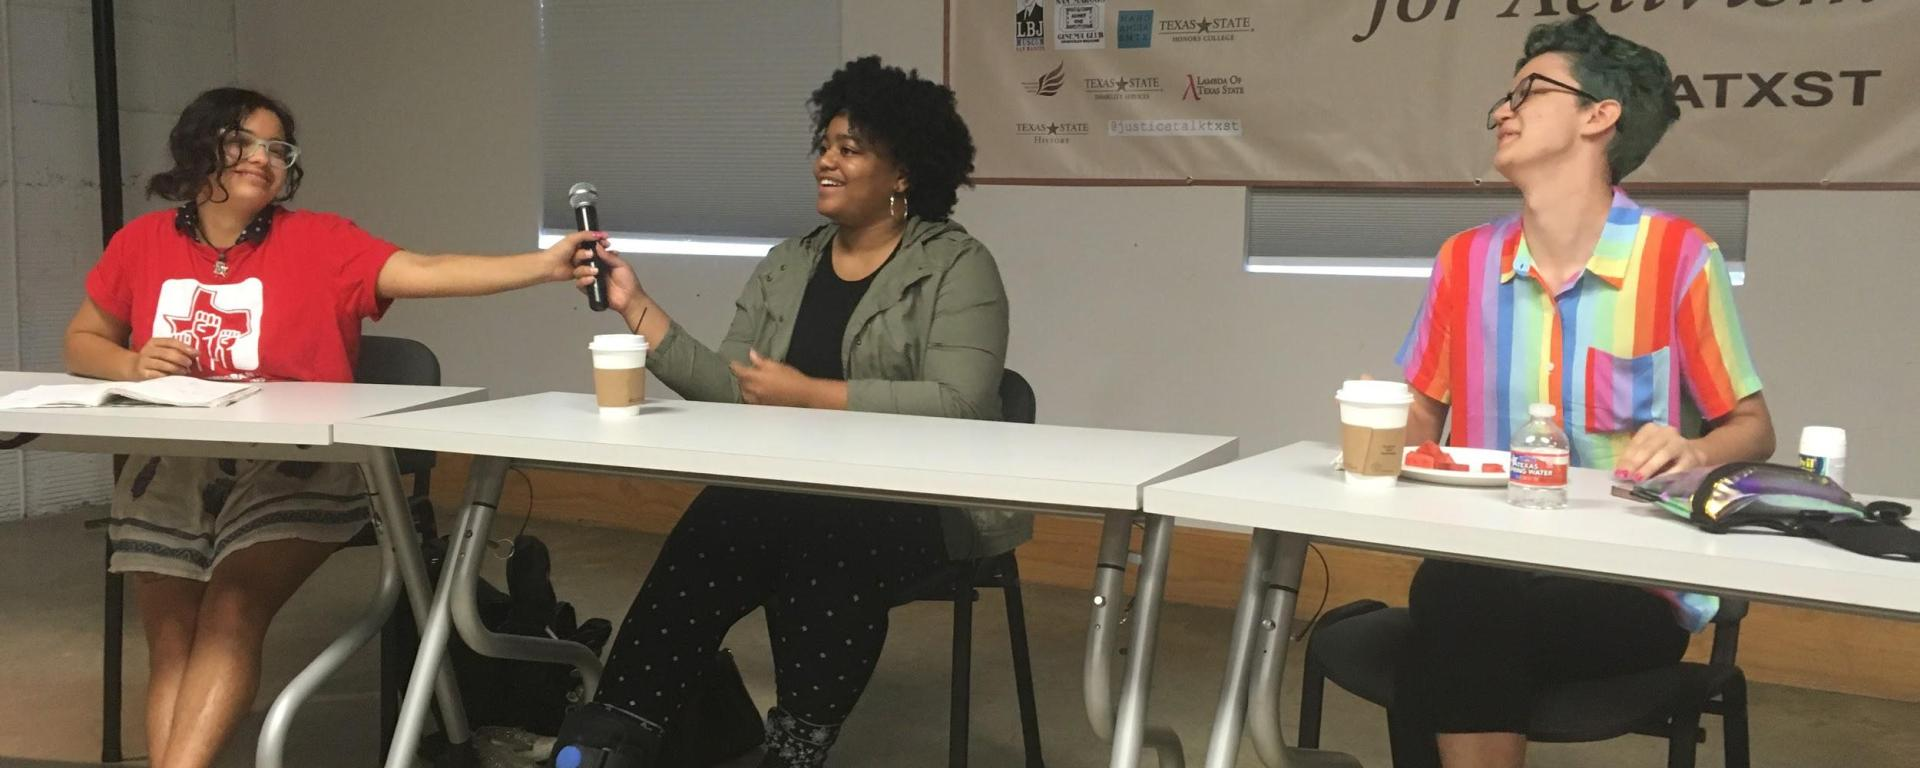 Claudia Gasponi, Cassidy Wright, and Monica Richerson discuss campus activism.